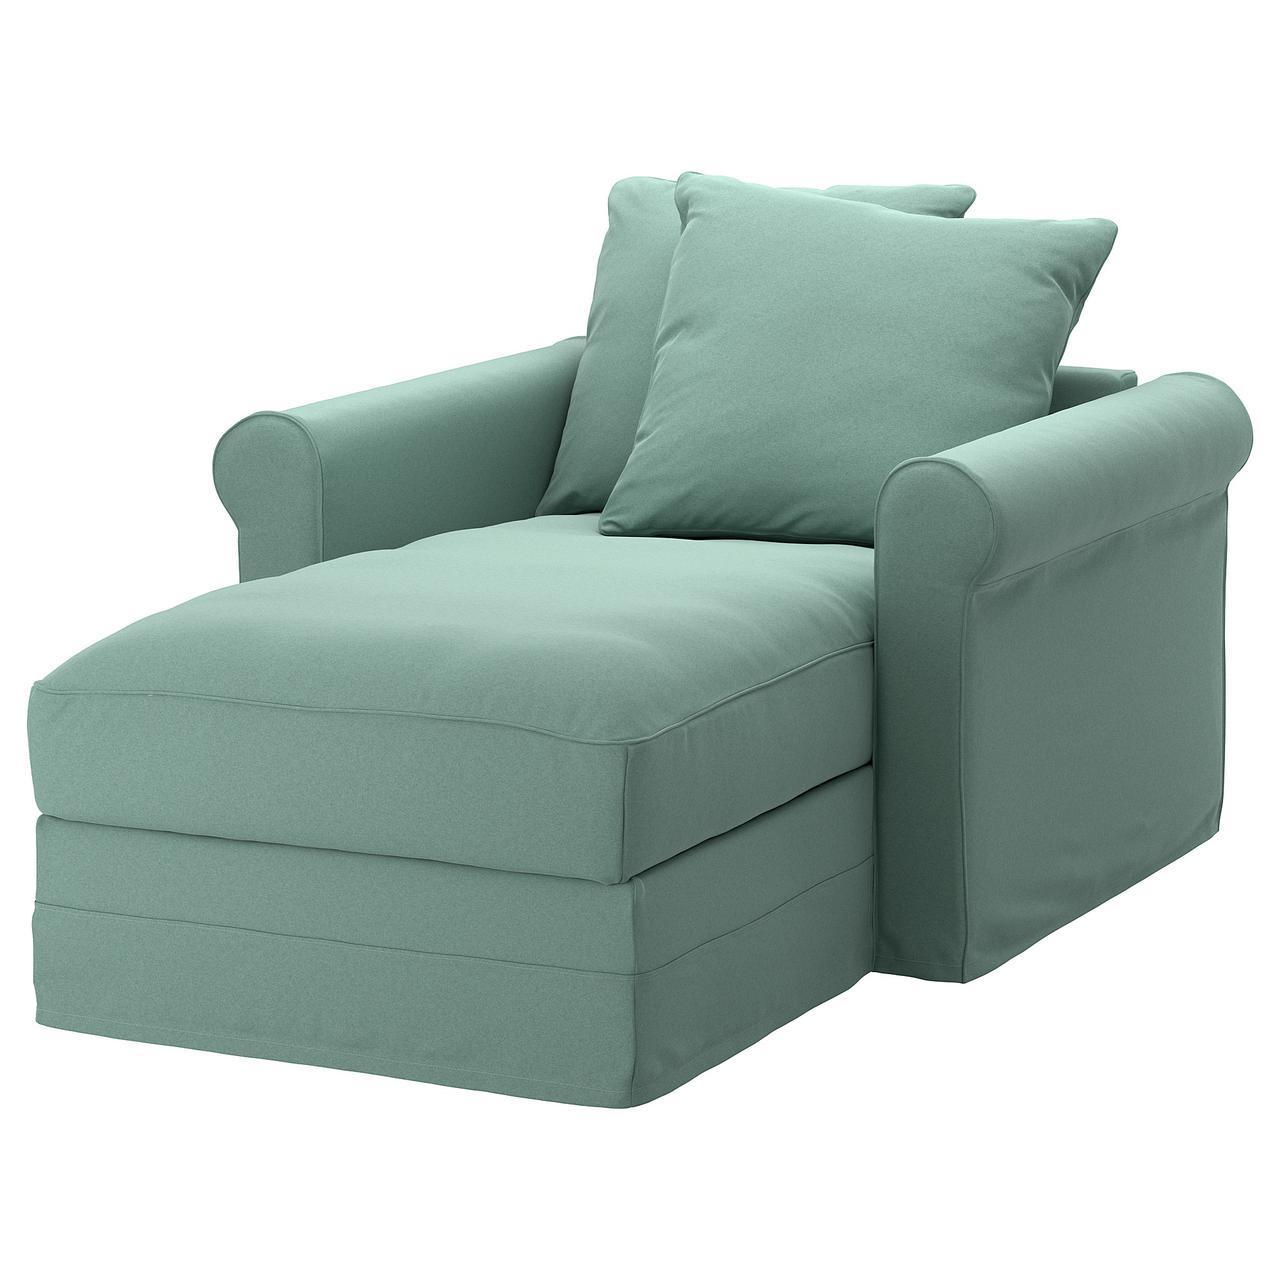 IKEA GRONLID (892.562.62) Шезлонги, Inseros светло-голубой